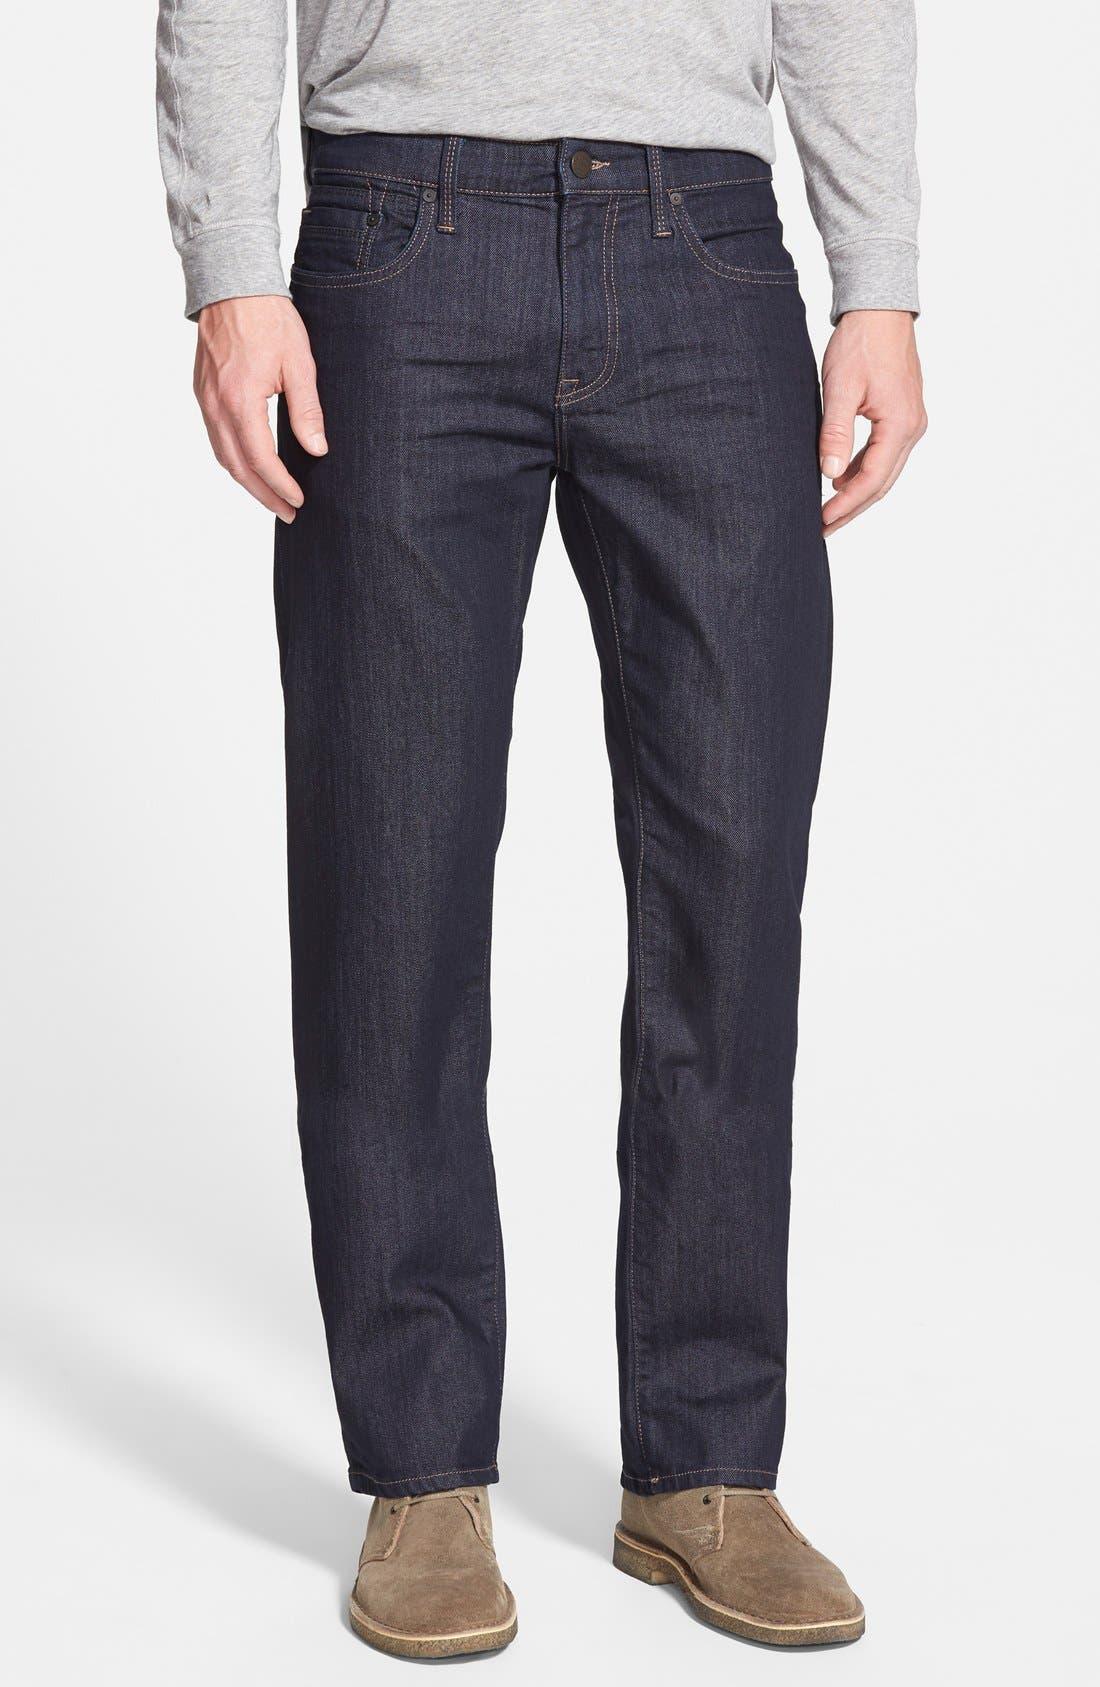 Zach Straight Leg Jeans,                         Main,                         color, RINSE WILLIAMSBURG